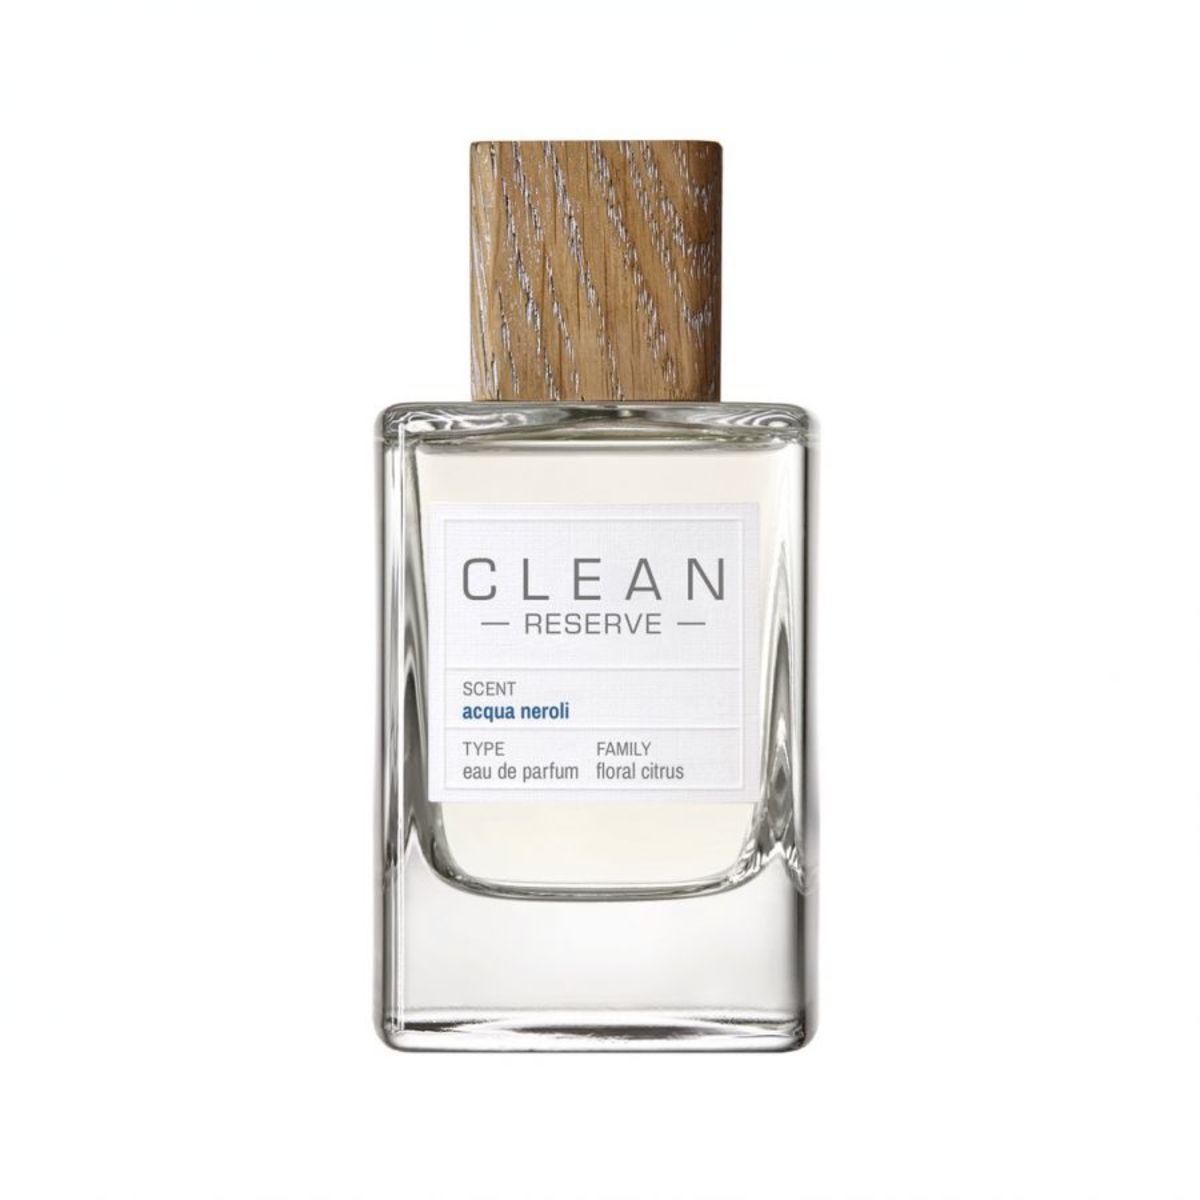 Clean-Acqua-Neroli